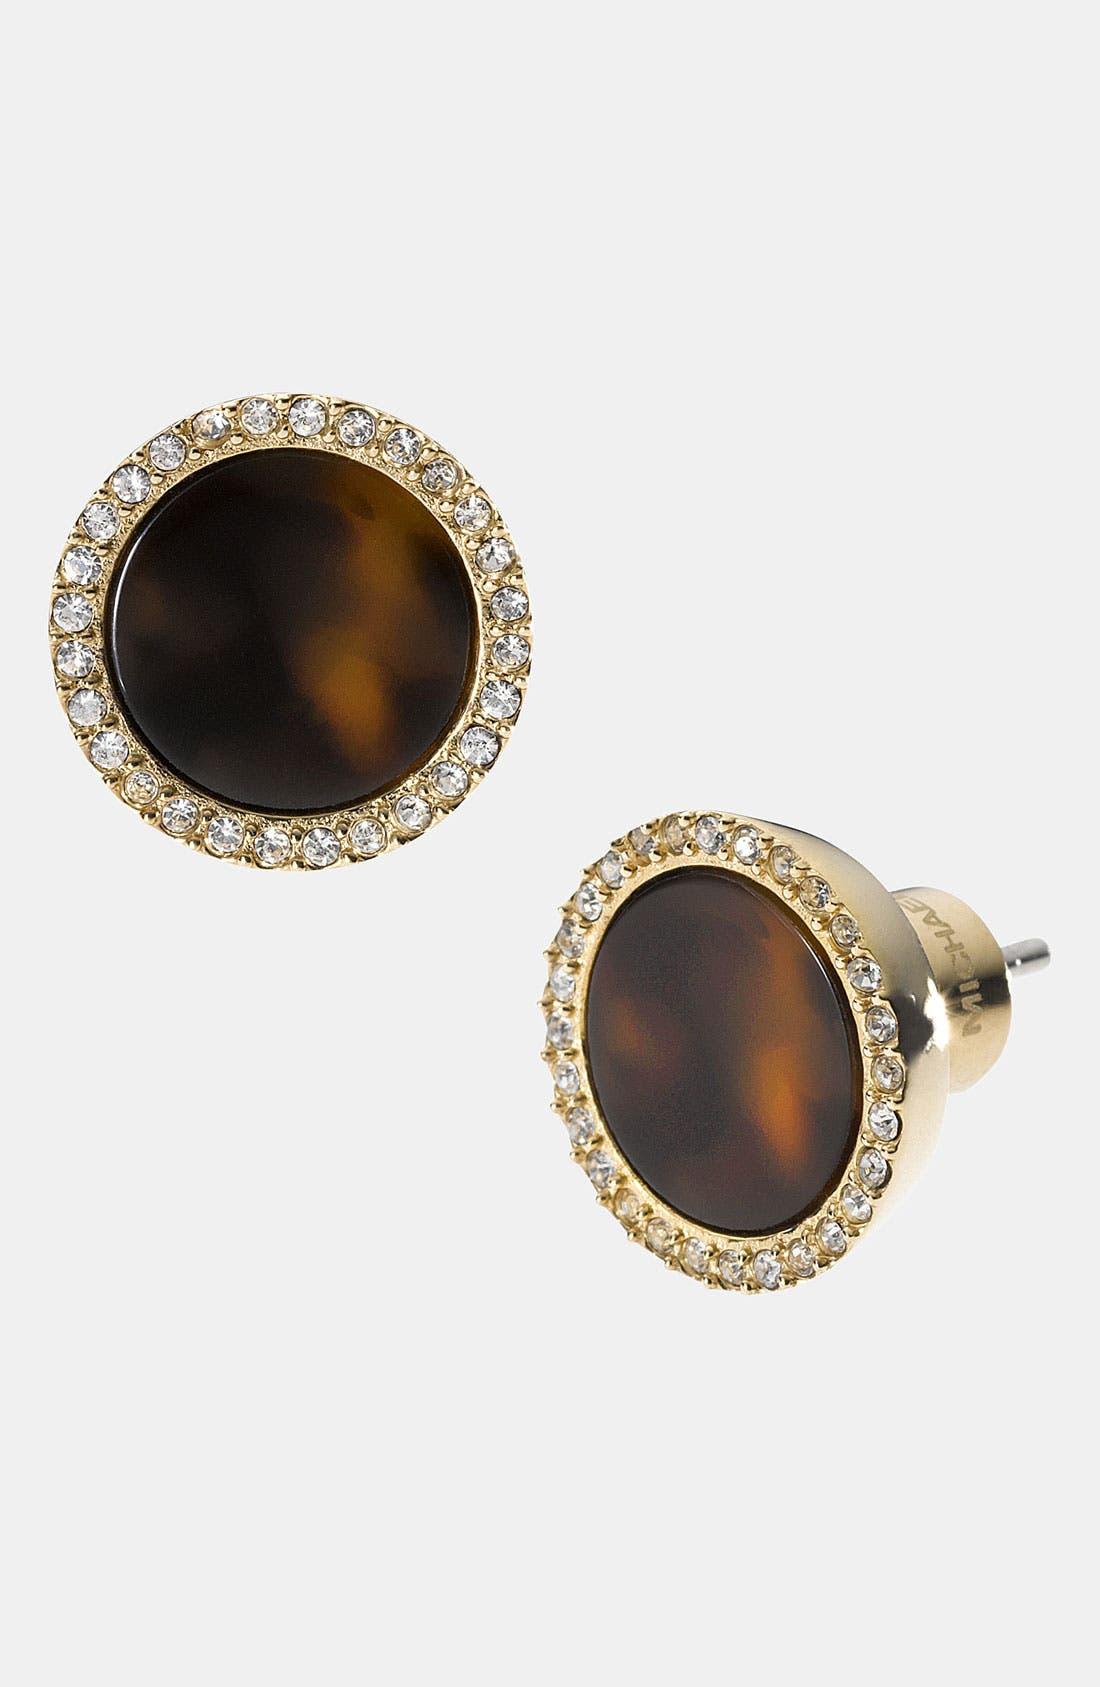 Michael Kors 'Brilliance' Stud Earrings,                             Main thumbnail 1, color,                             Tortoise/ Clear/ Gold